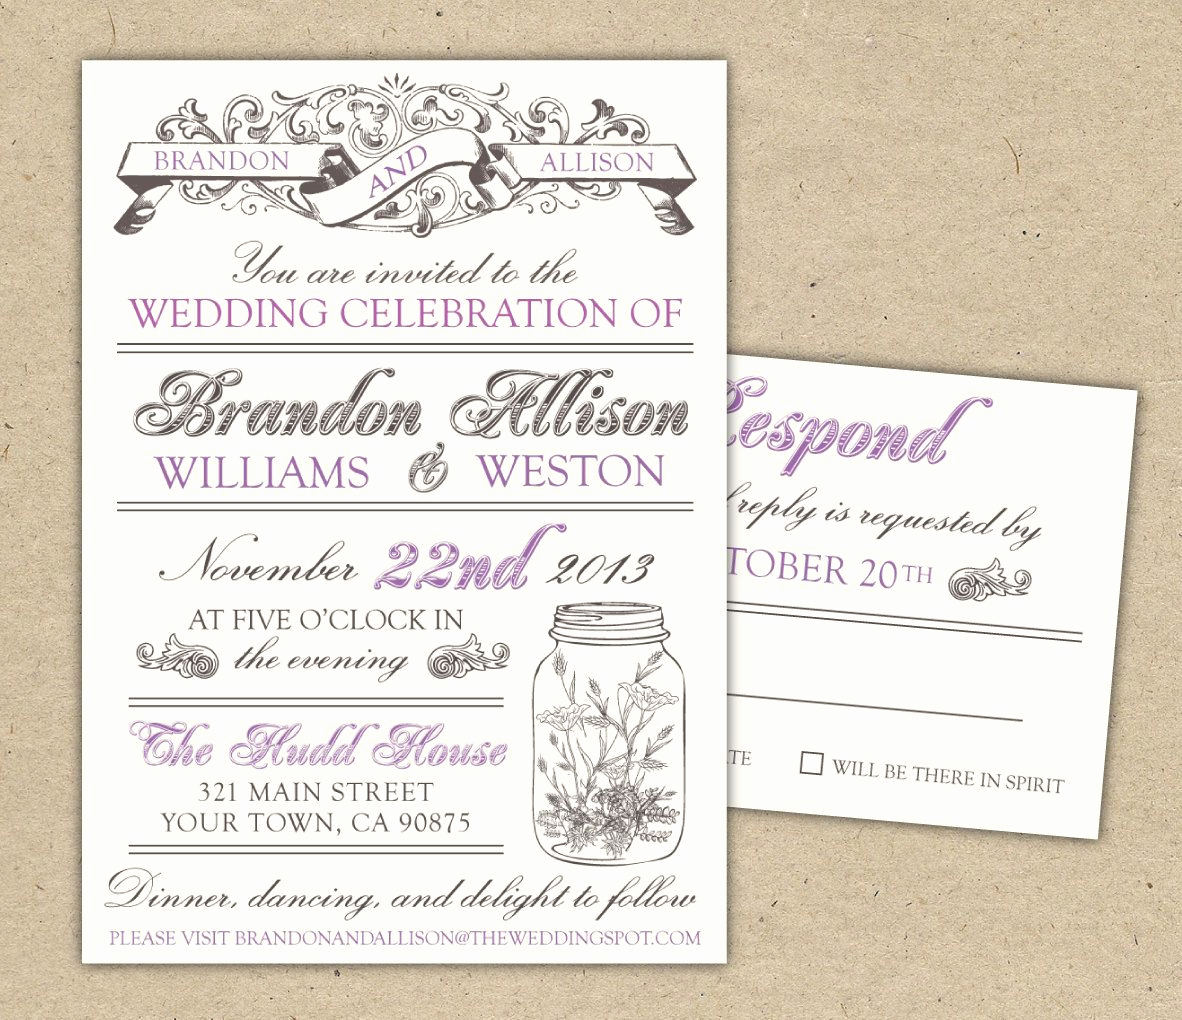 Wedding Invitation Templates Free Download Elegant Free Templates for Invitations